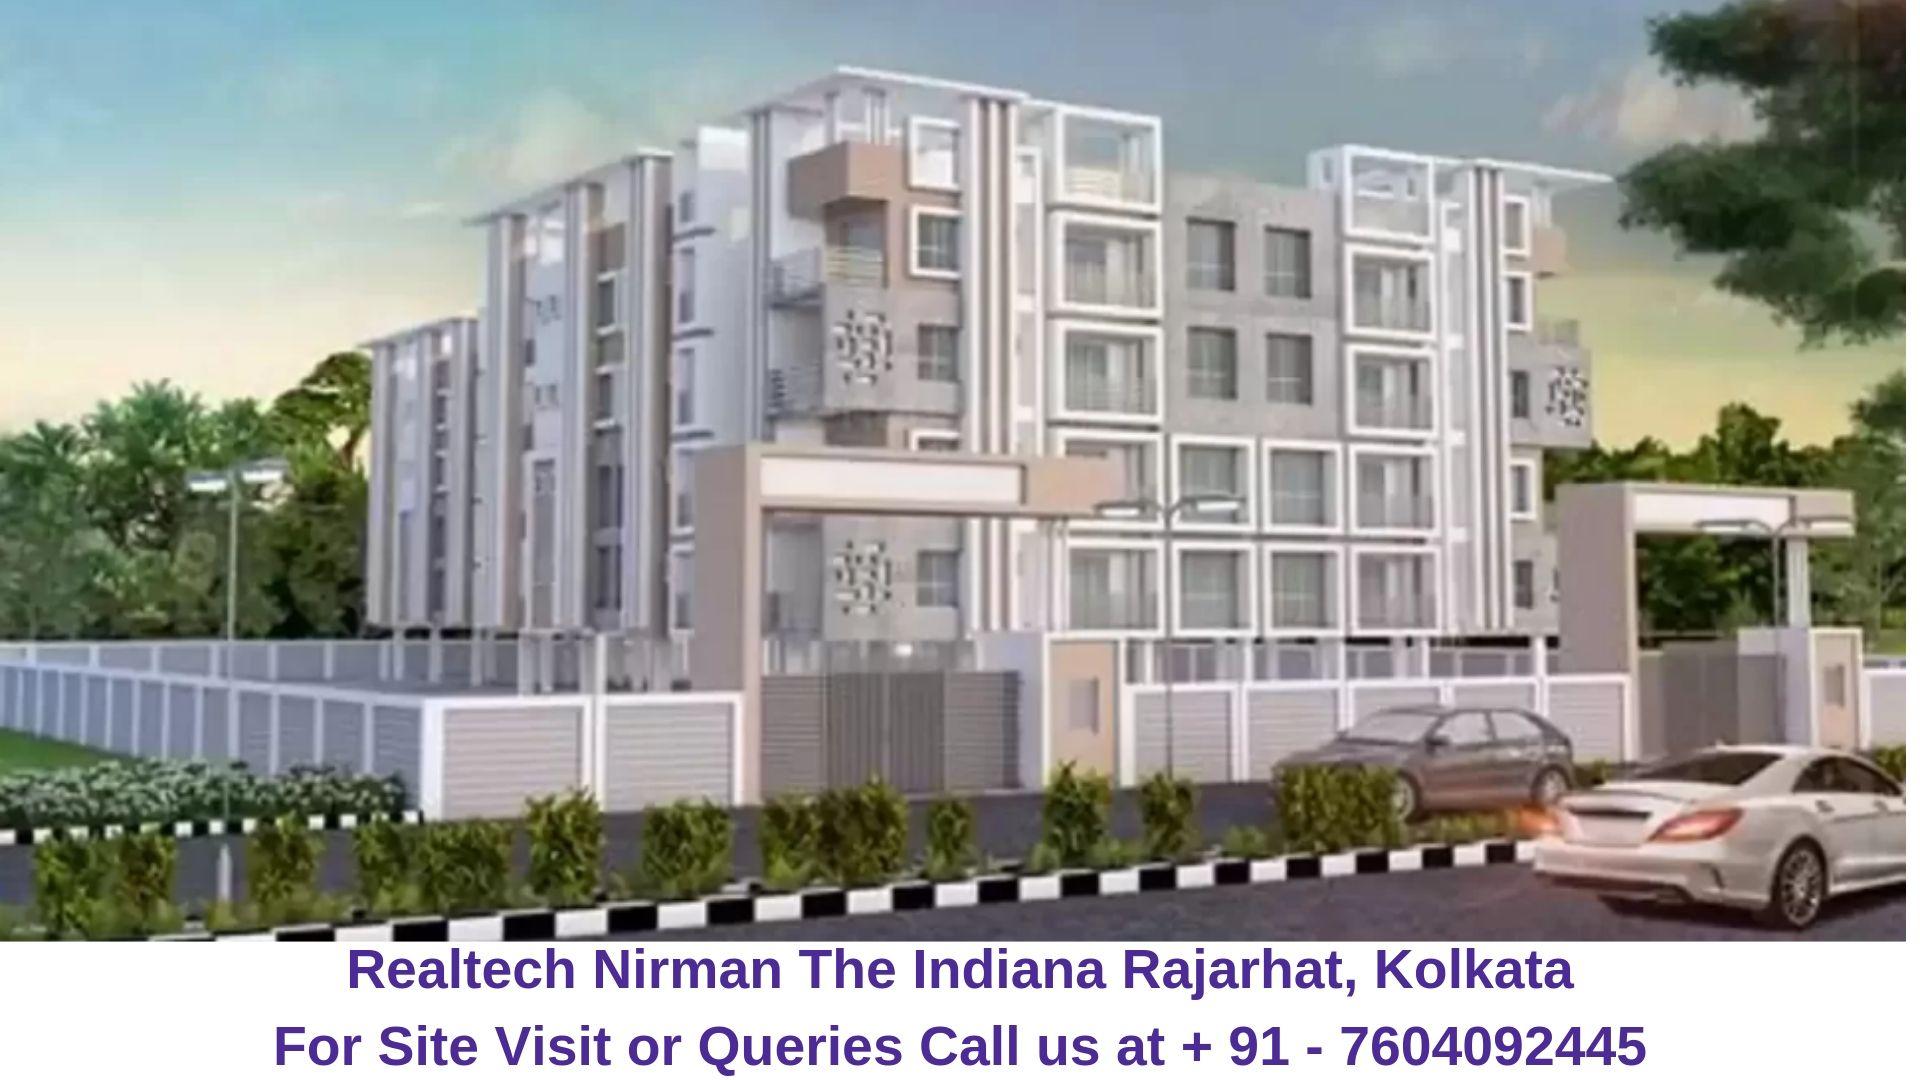 Realtech Nirman The Indiana Rajarhat, Kolkata